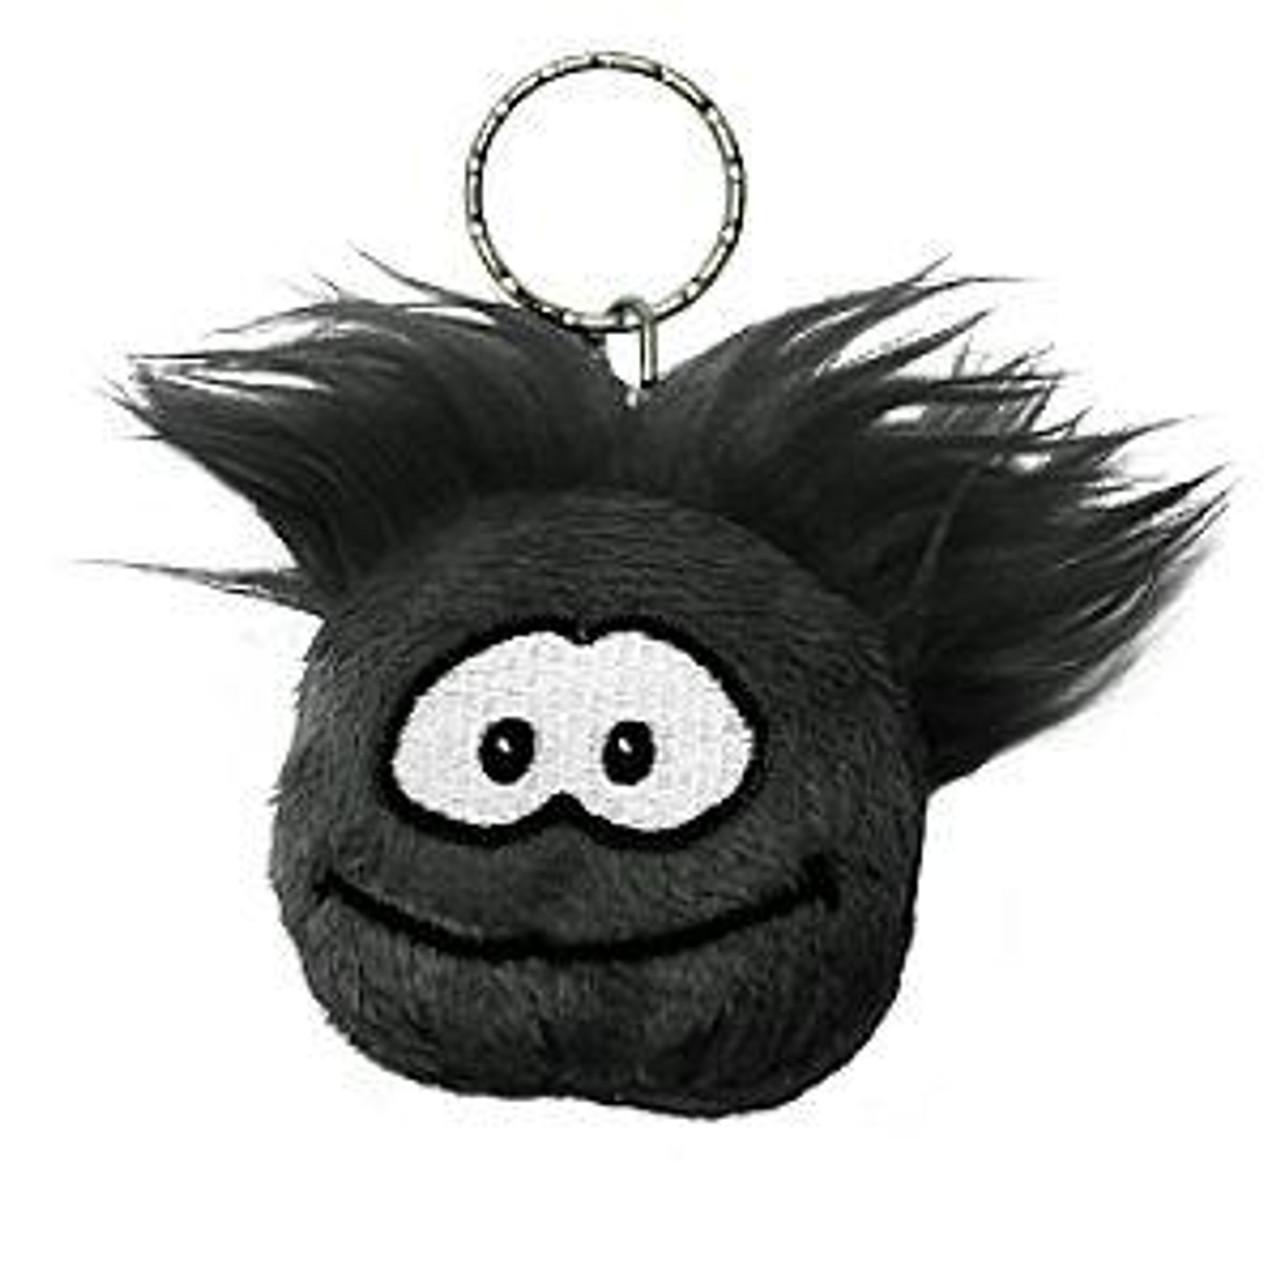 Club Penguin Black Puffle 2-Inch Plush Keychain